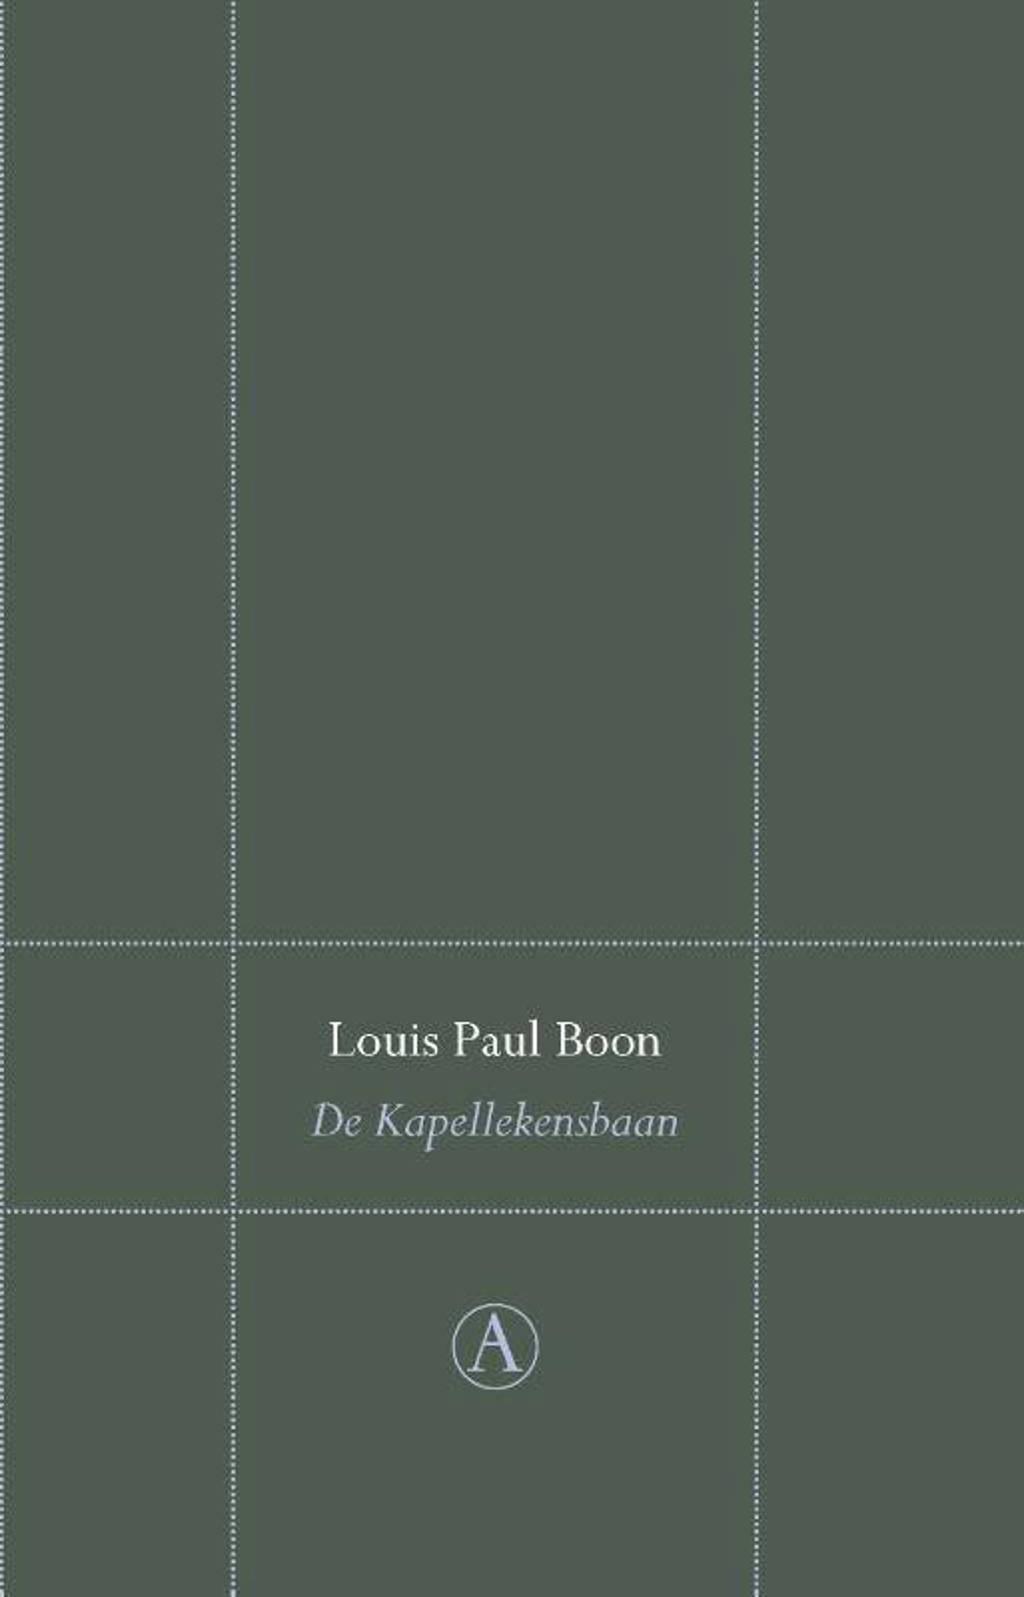 De kapellekensbaan - Louis Paul Boon